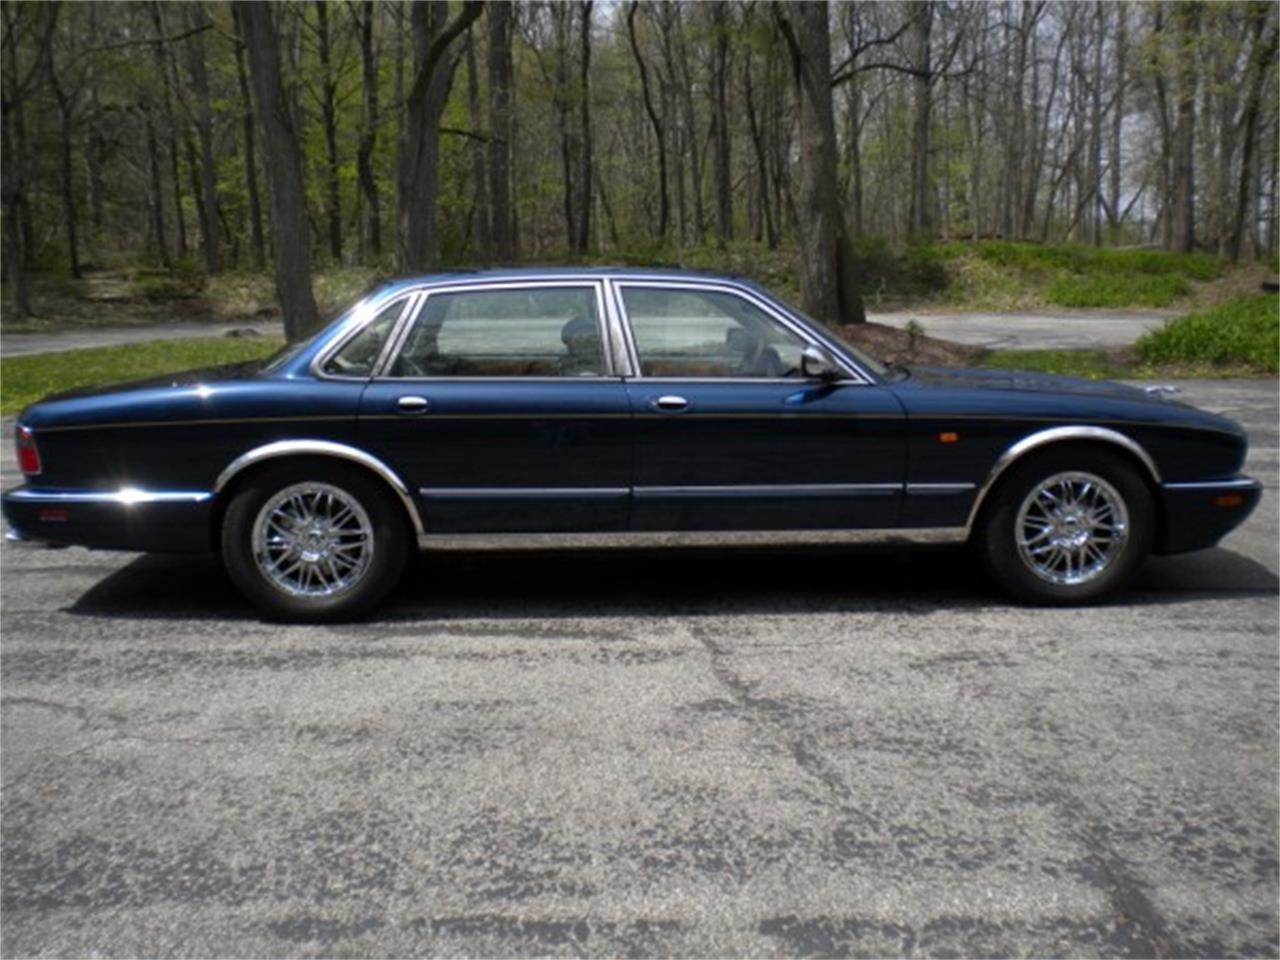 1995 Jaguar Xj6 For Sale Cc 970726 1970 In Sapphire Blue Large Picture Of 95 Kt0m